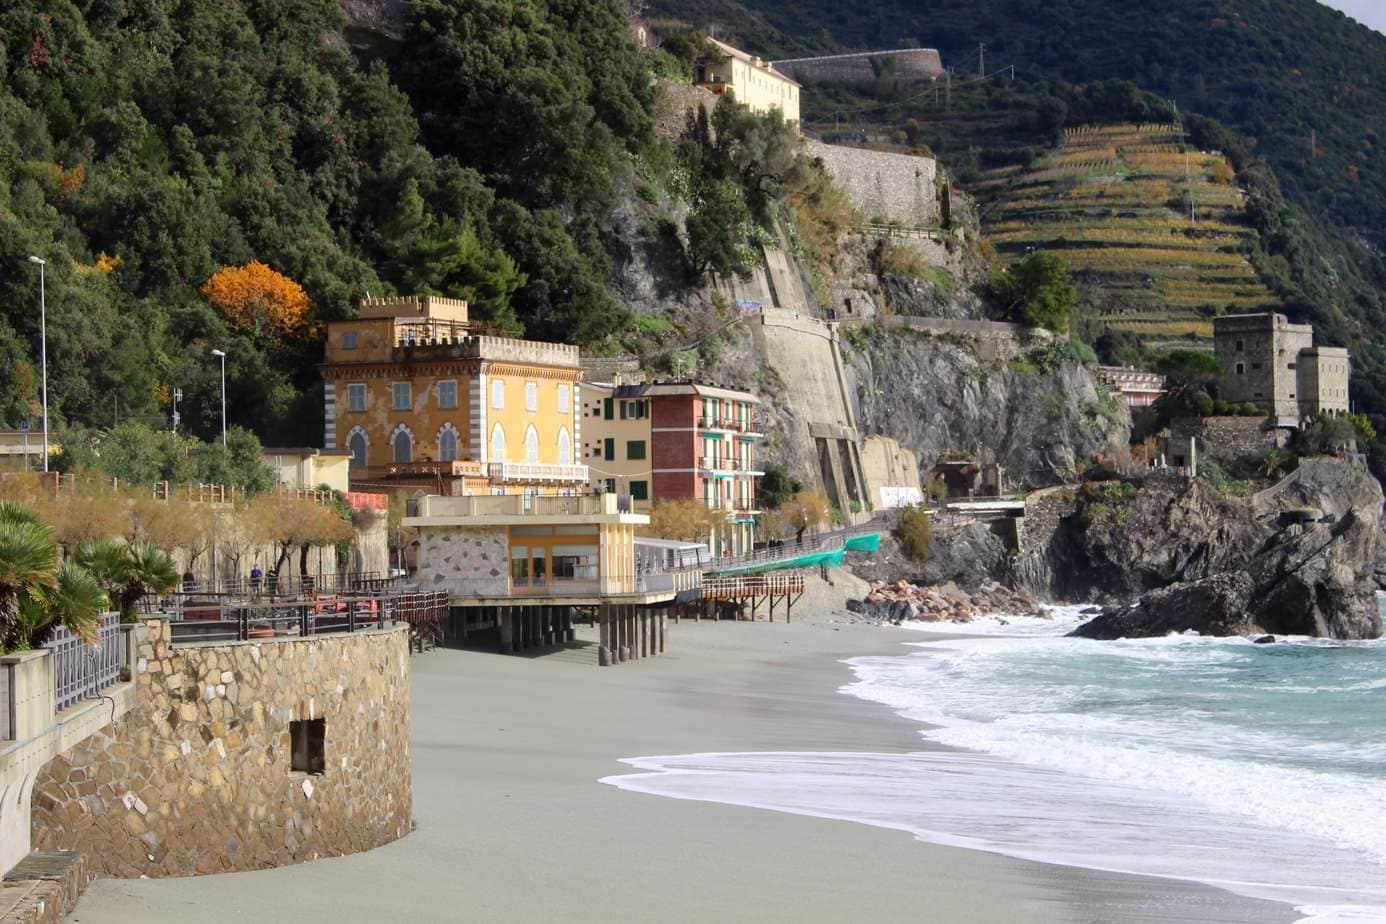 Entering Monterosso